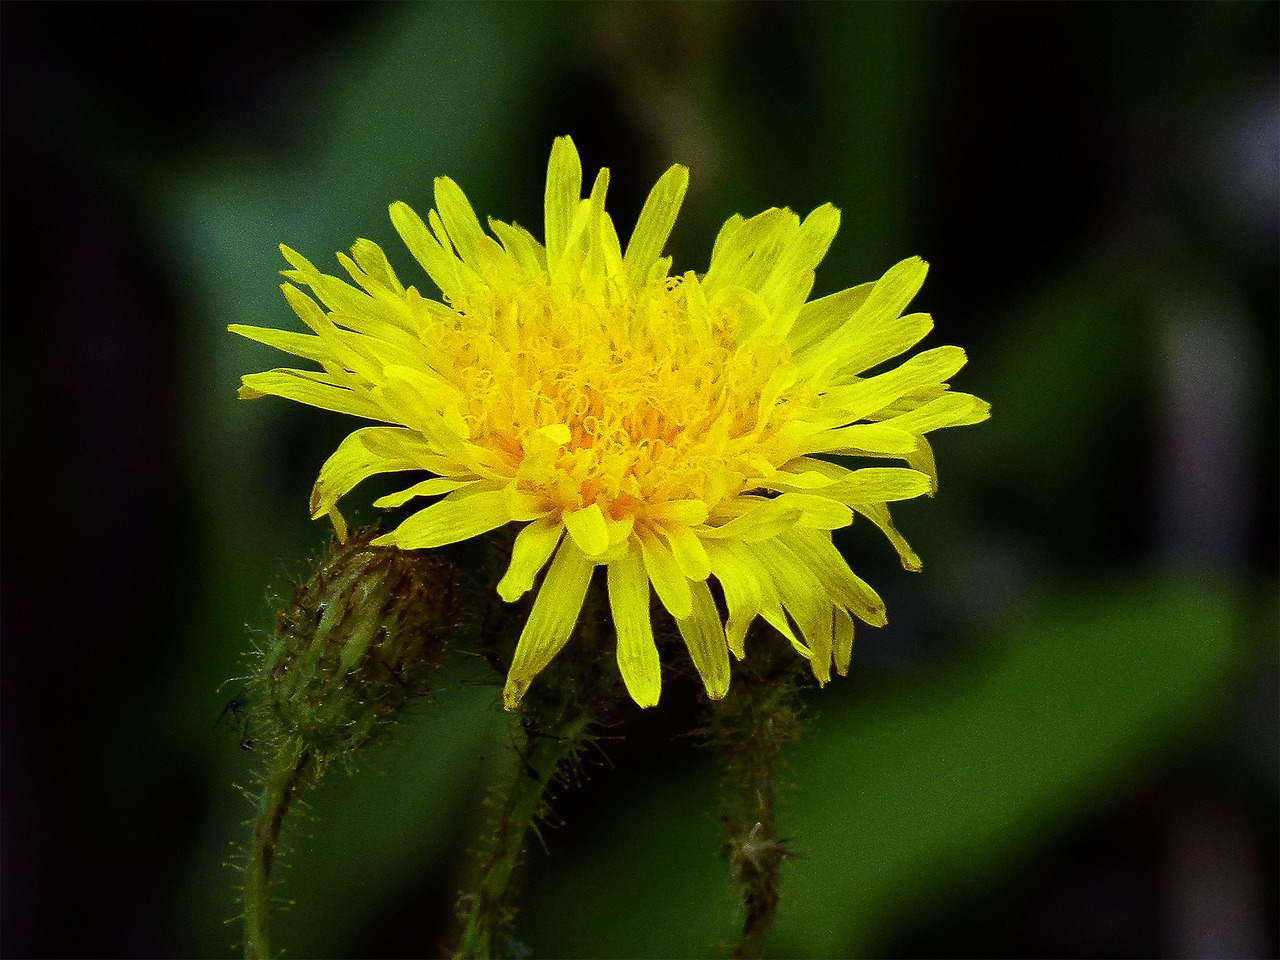 Yellowwild Flowernaturesummer Flowersbloom Free Photo From